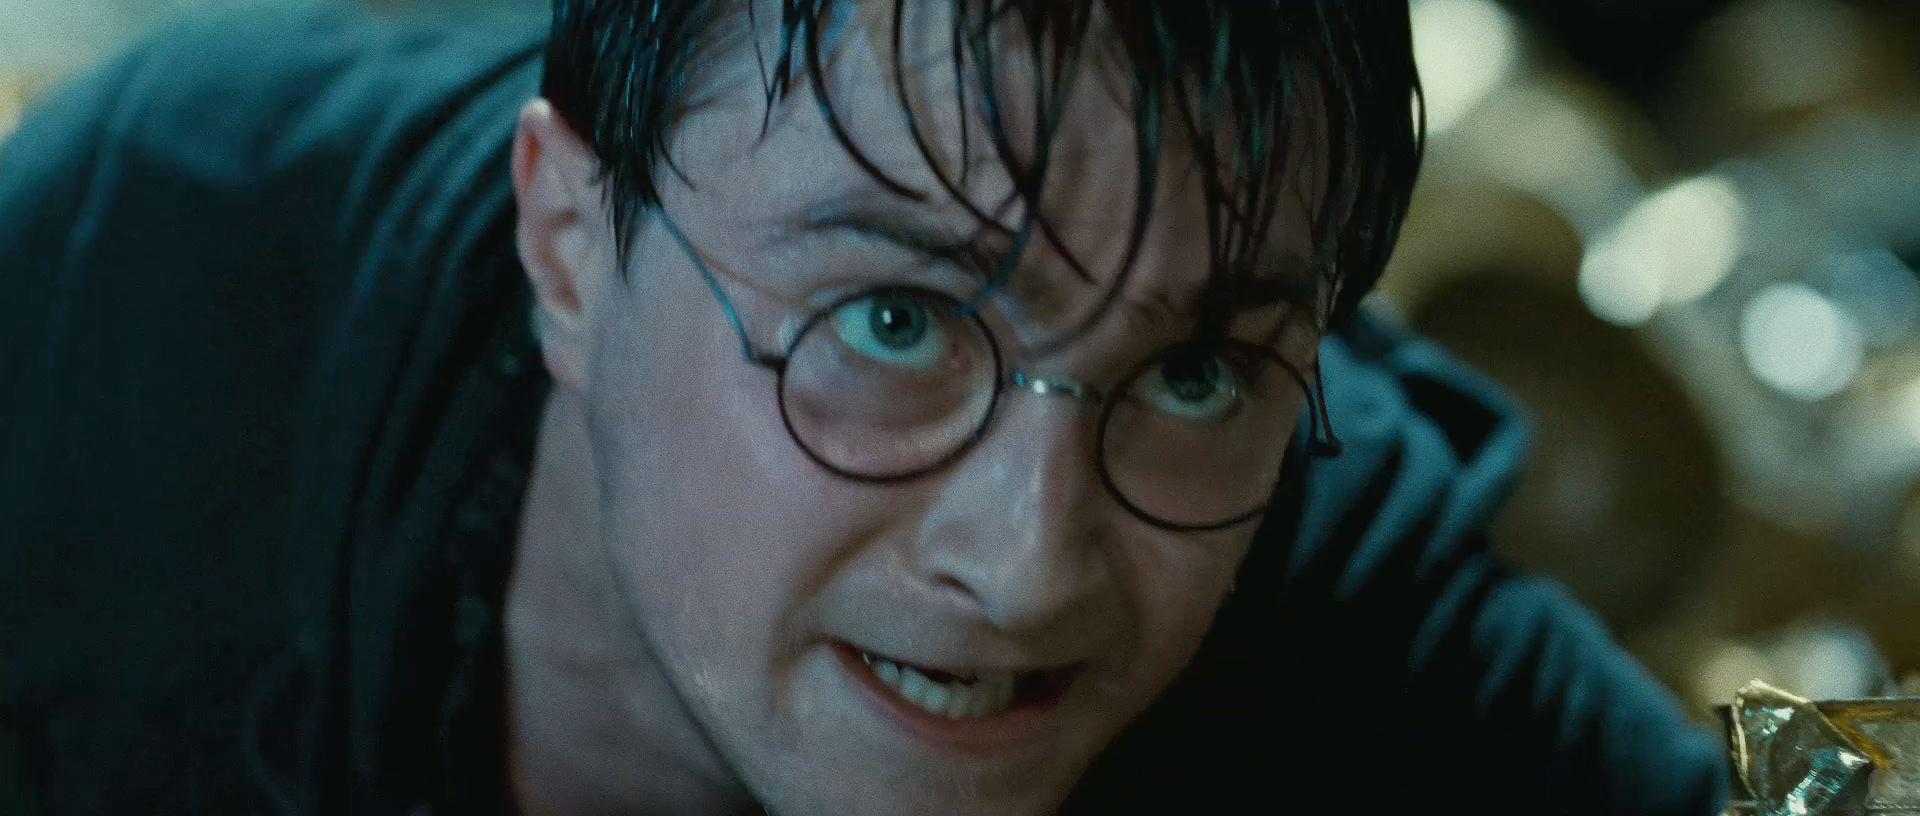 Harry Potter BlogHogwarts HP7 2 Trailer 55